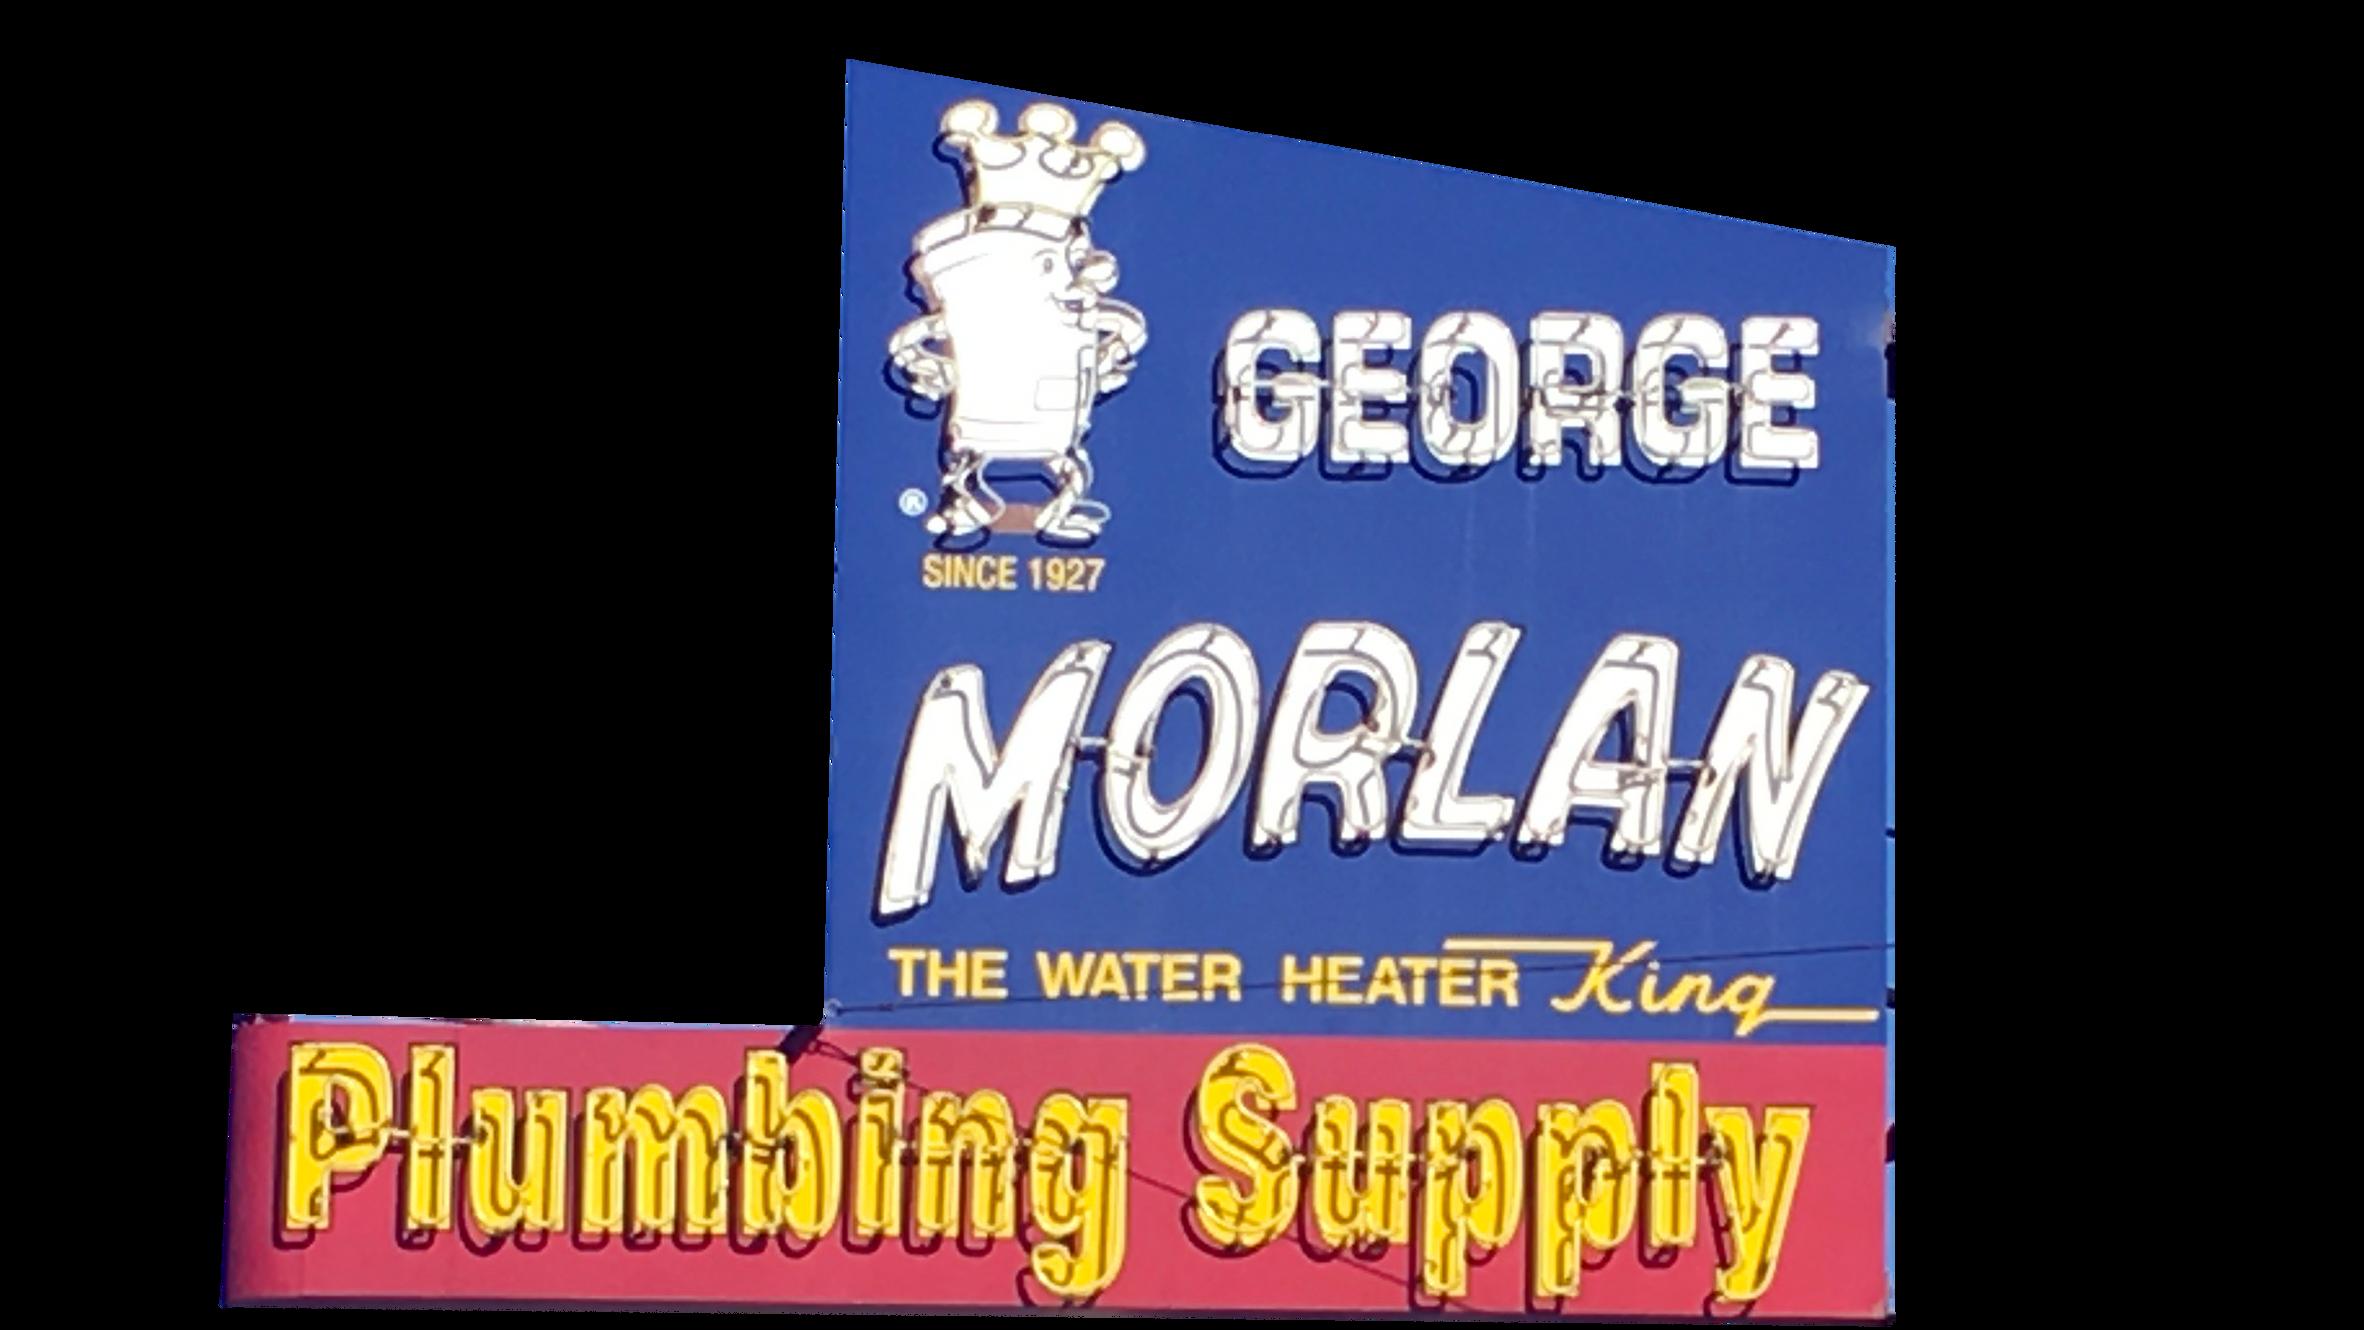 George Morlan Plumbing Supply   Emergency Hot Water Service